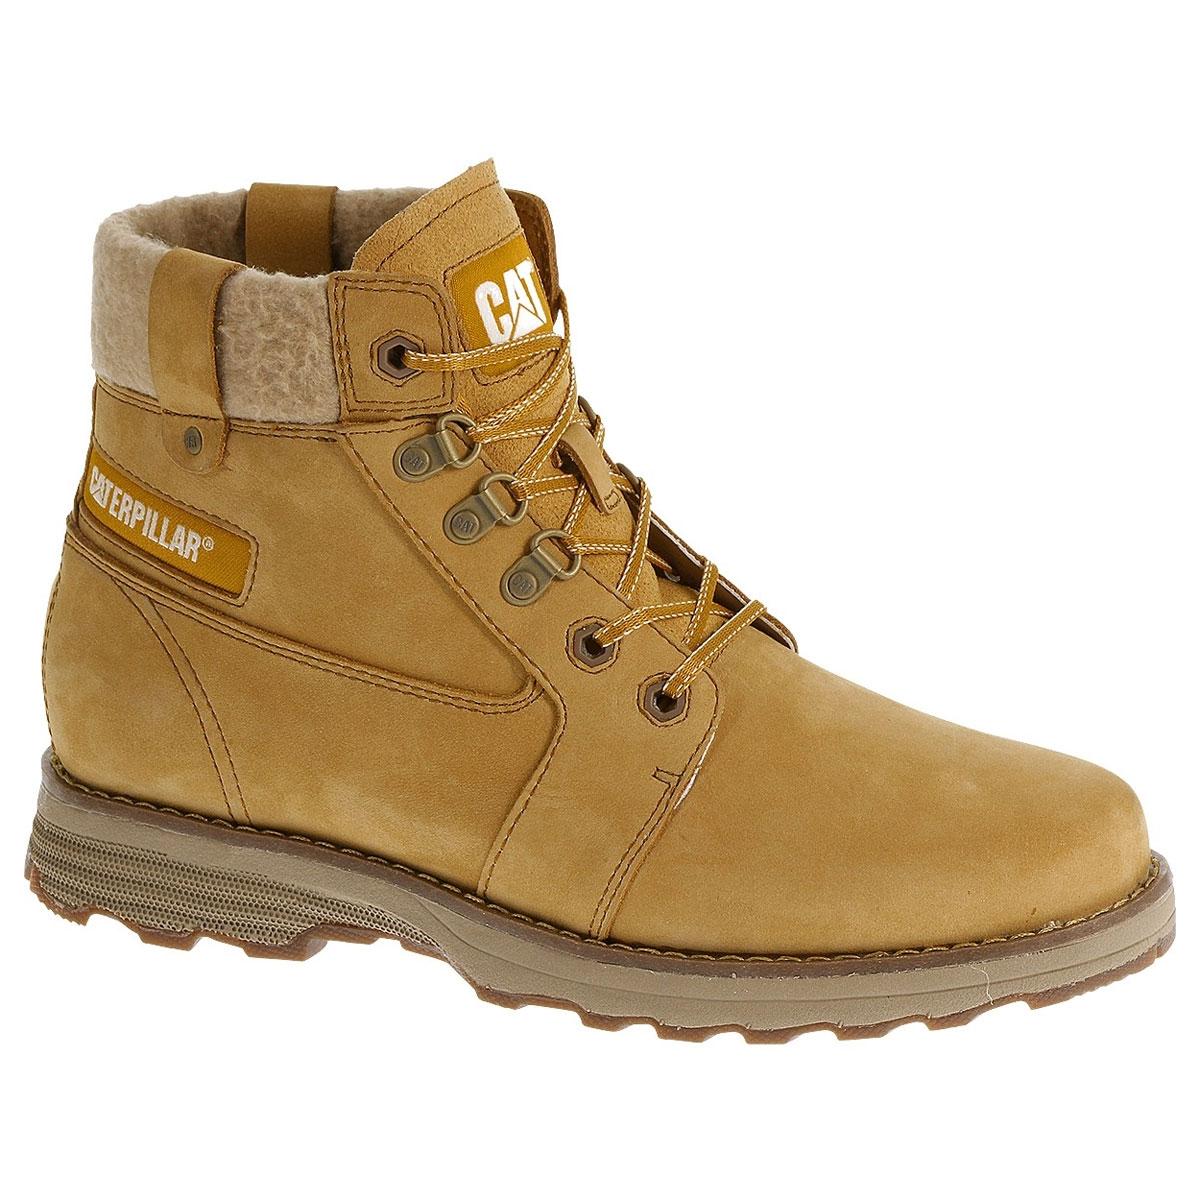 Image of CAT Charli Casual Boots (Women s) - Honey Reset 592e1b2923